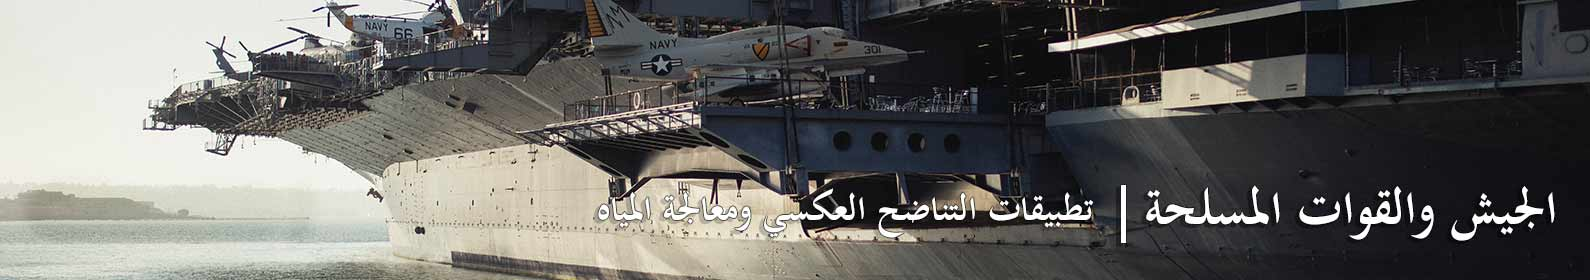 -military-industry.jpg